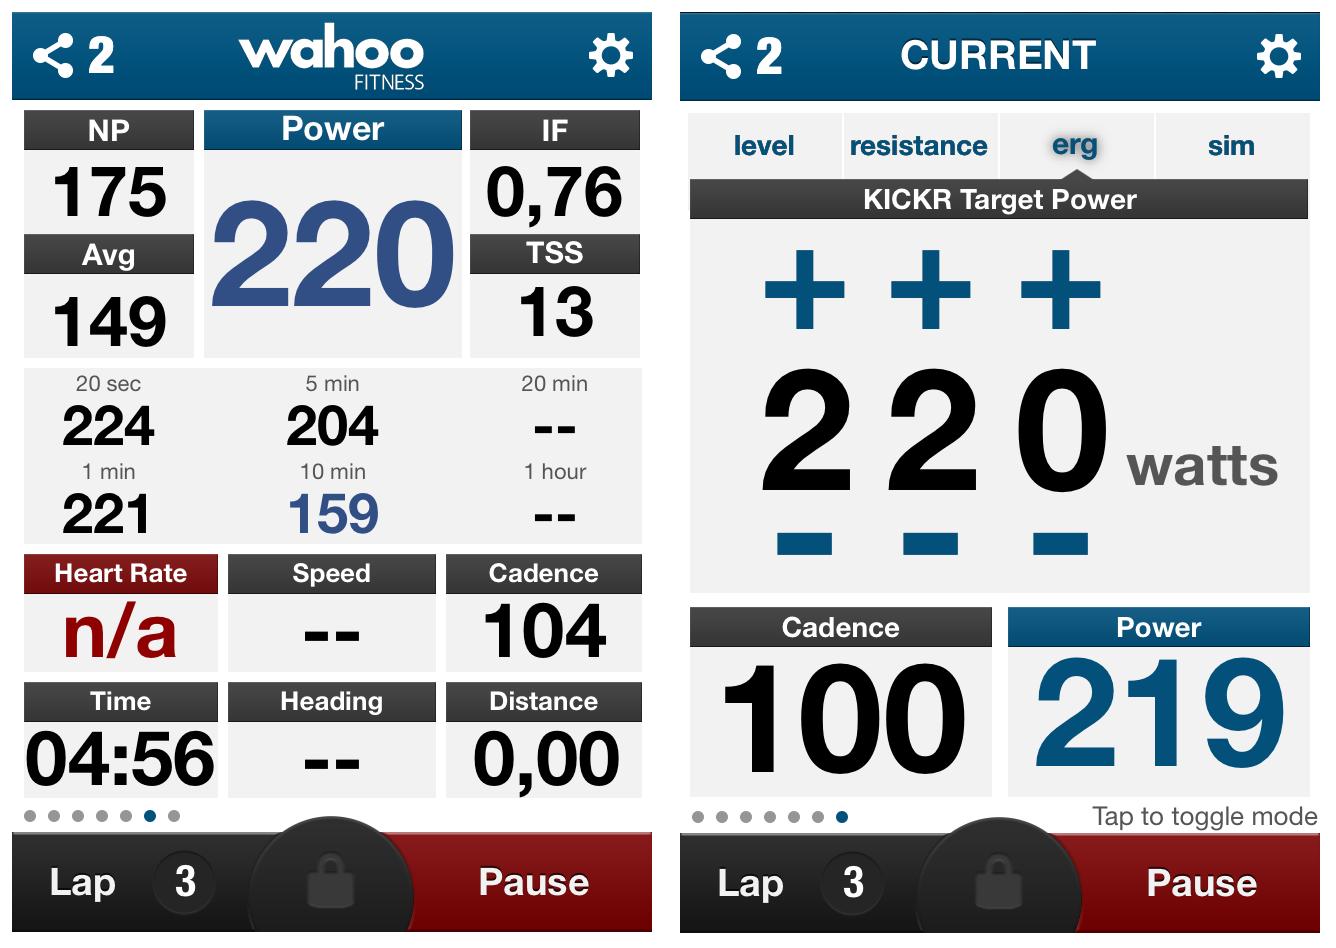 how to use wahoo fitness app